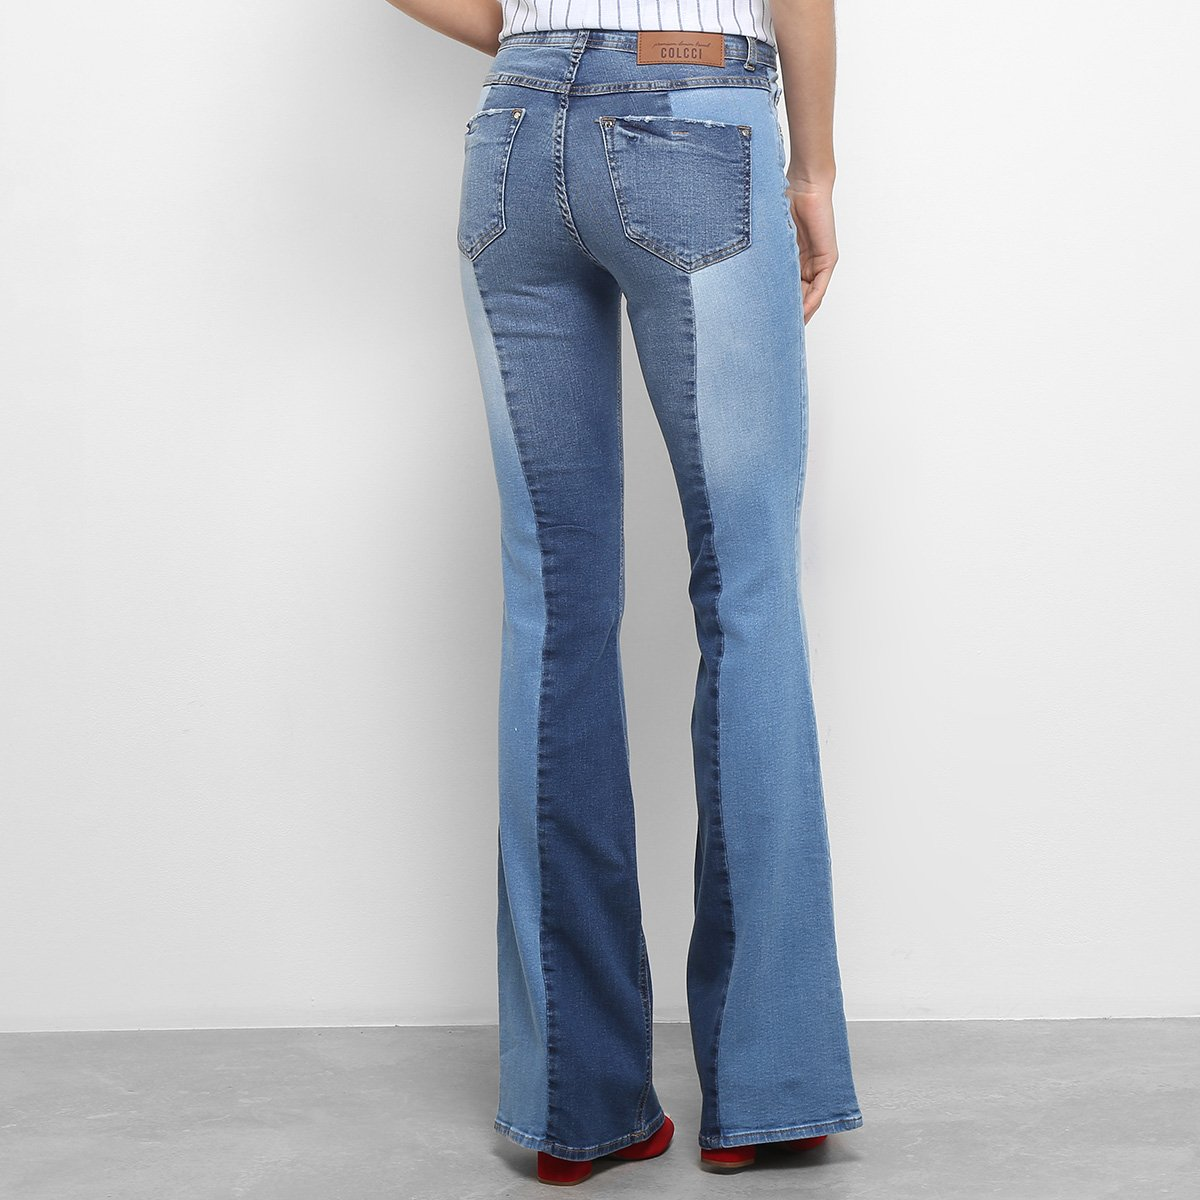 ... Foto 2 - Calça Jeans Flare Colcci Boot Cut Cintura Média Feminina 93b3468d907